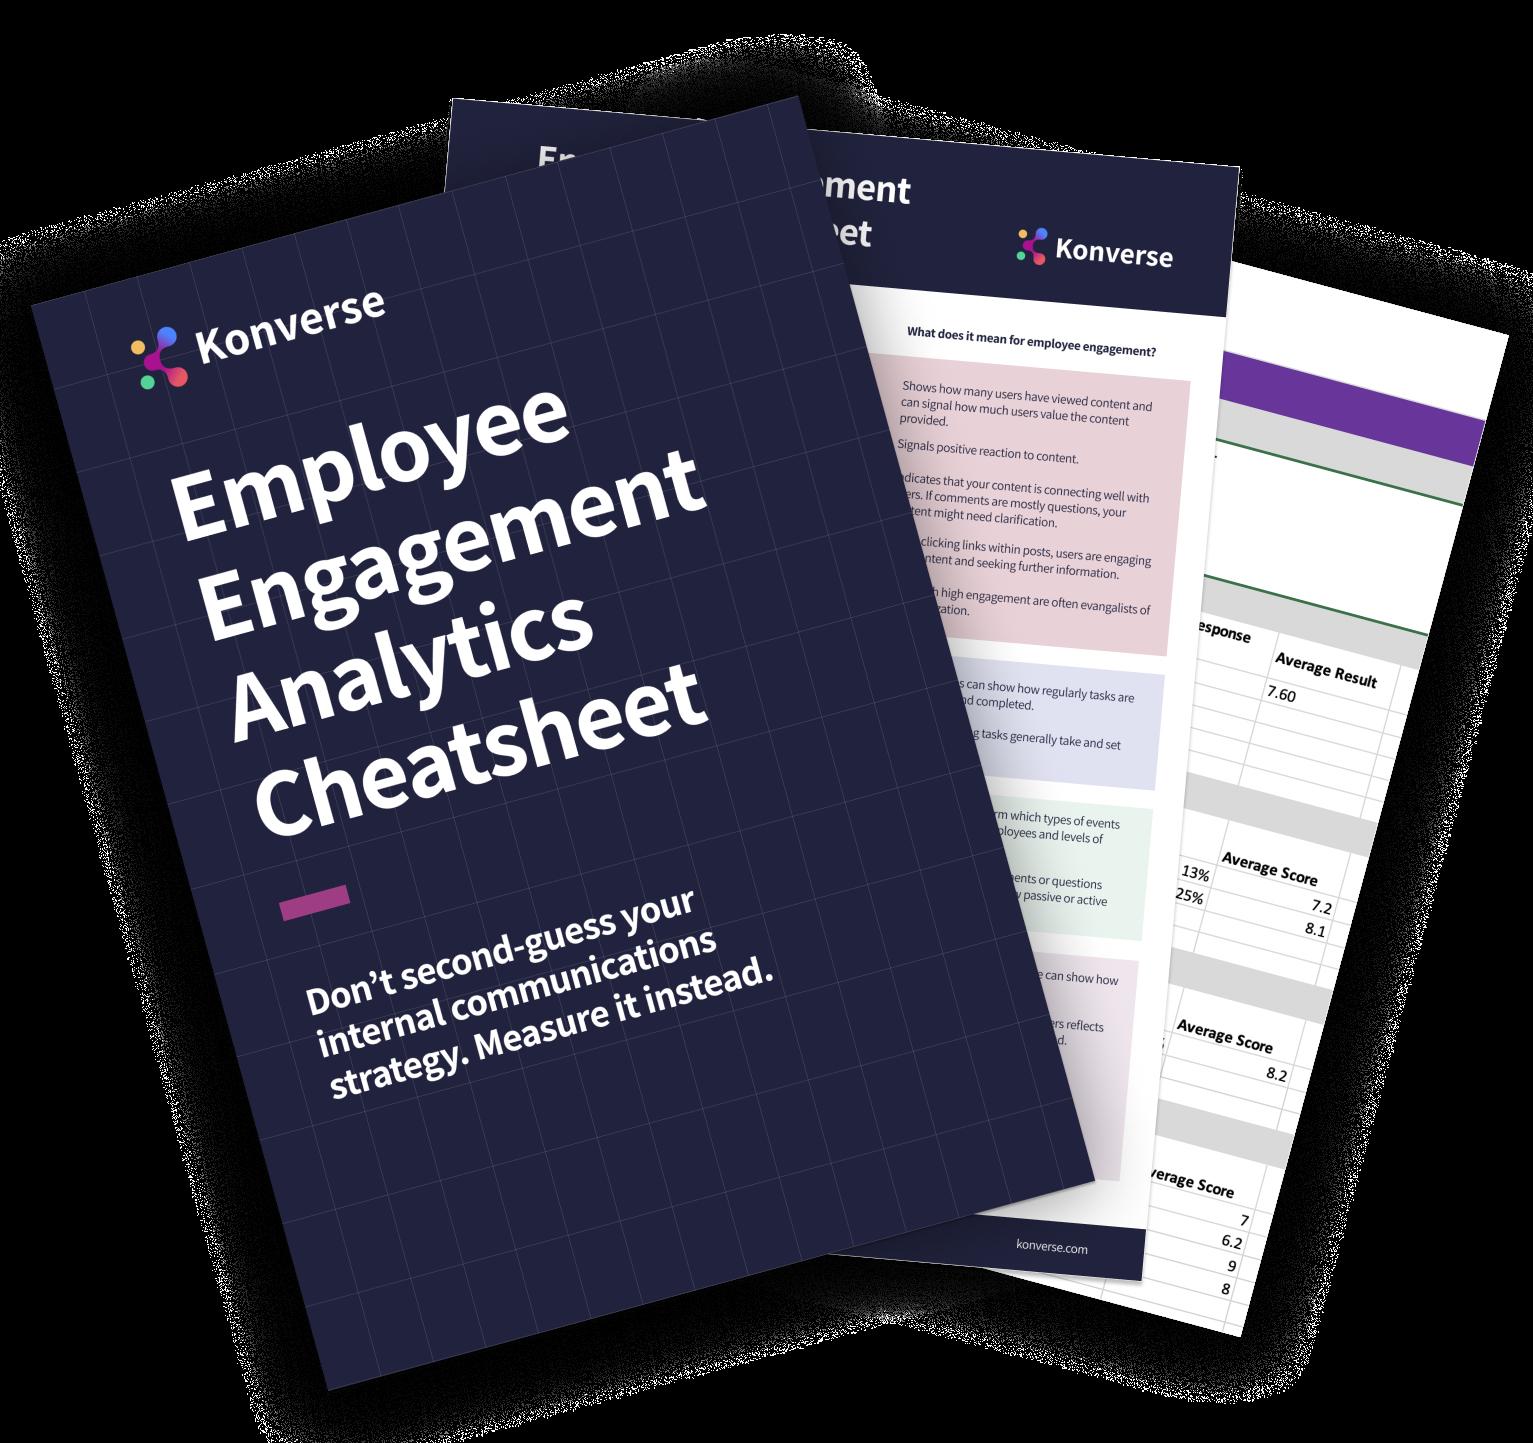 Employee Engagement analytics cheatsheet_Konverse